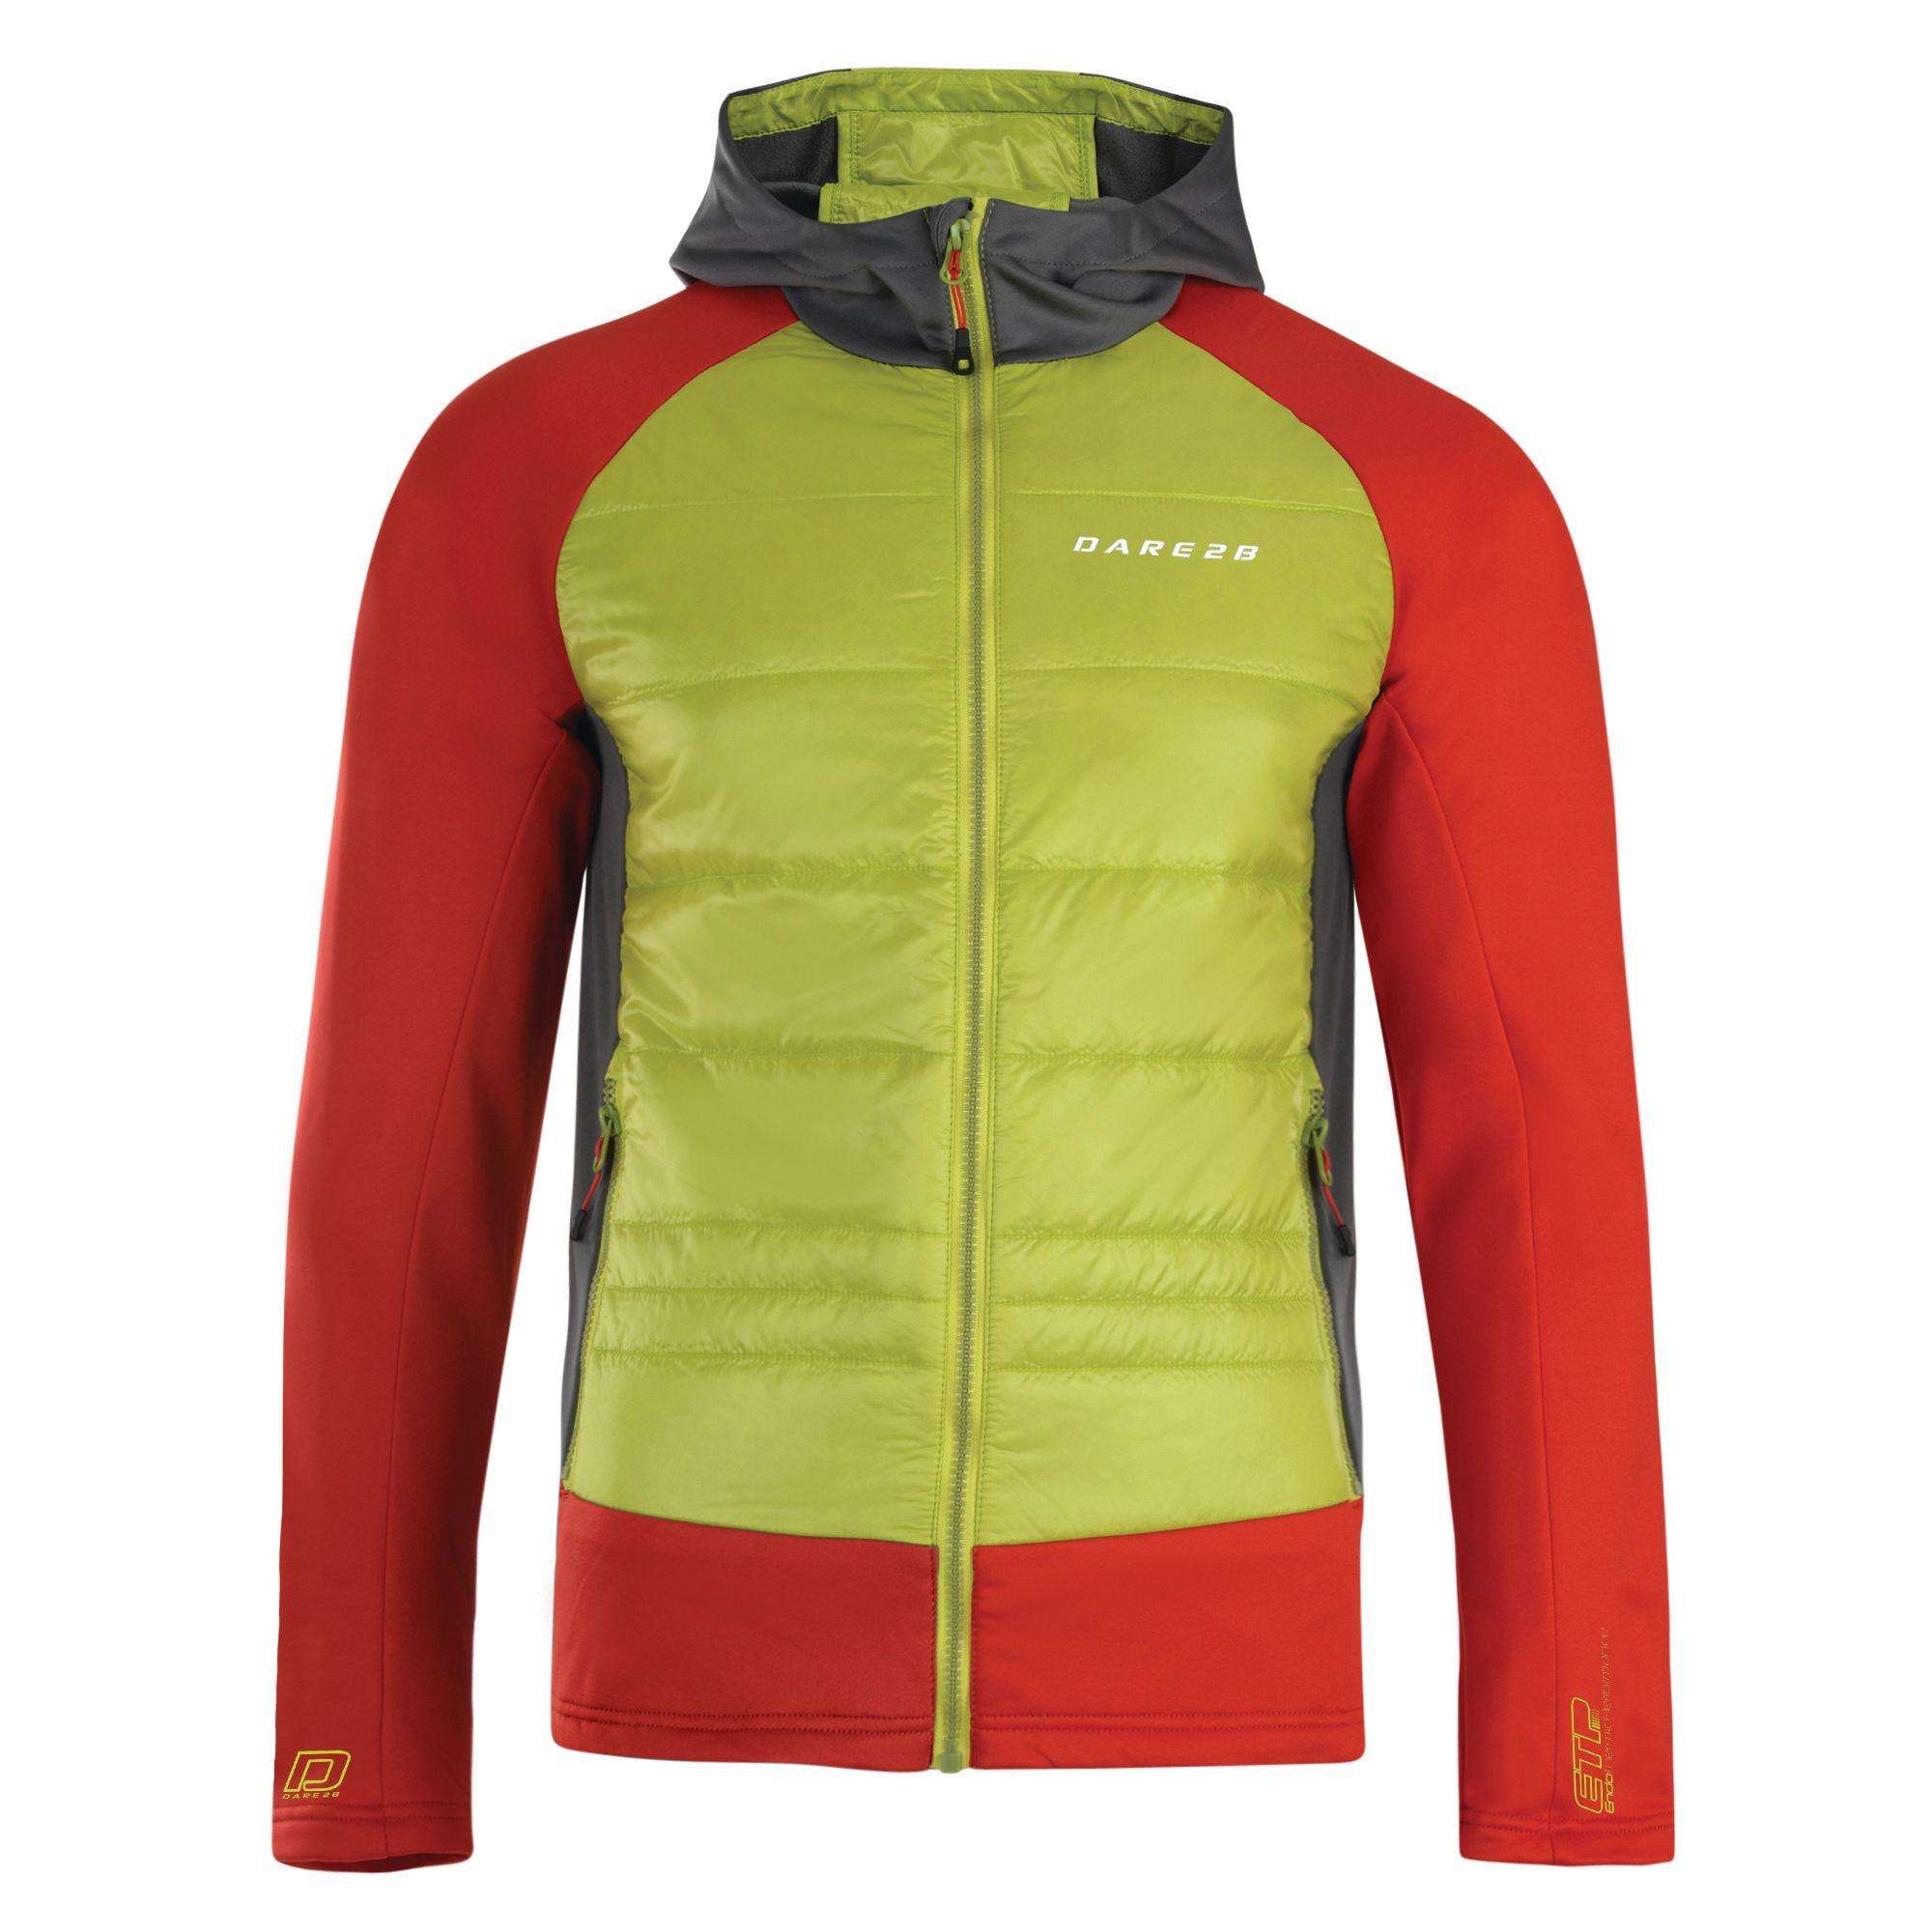 Dare2b Overshadow Men/'s Warm Backed Walking Hiking Sweater Jacket RRP £120